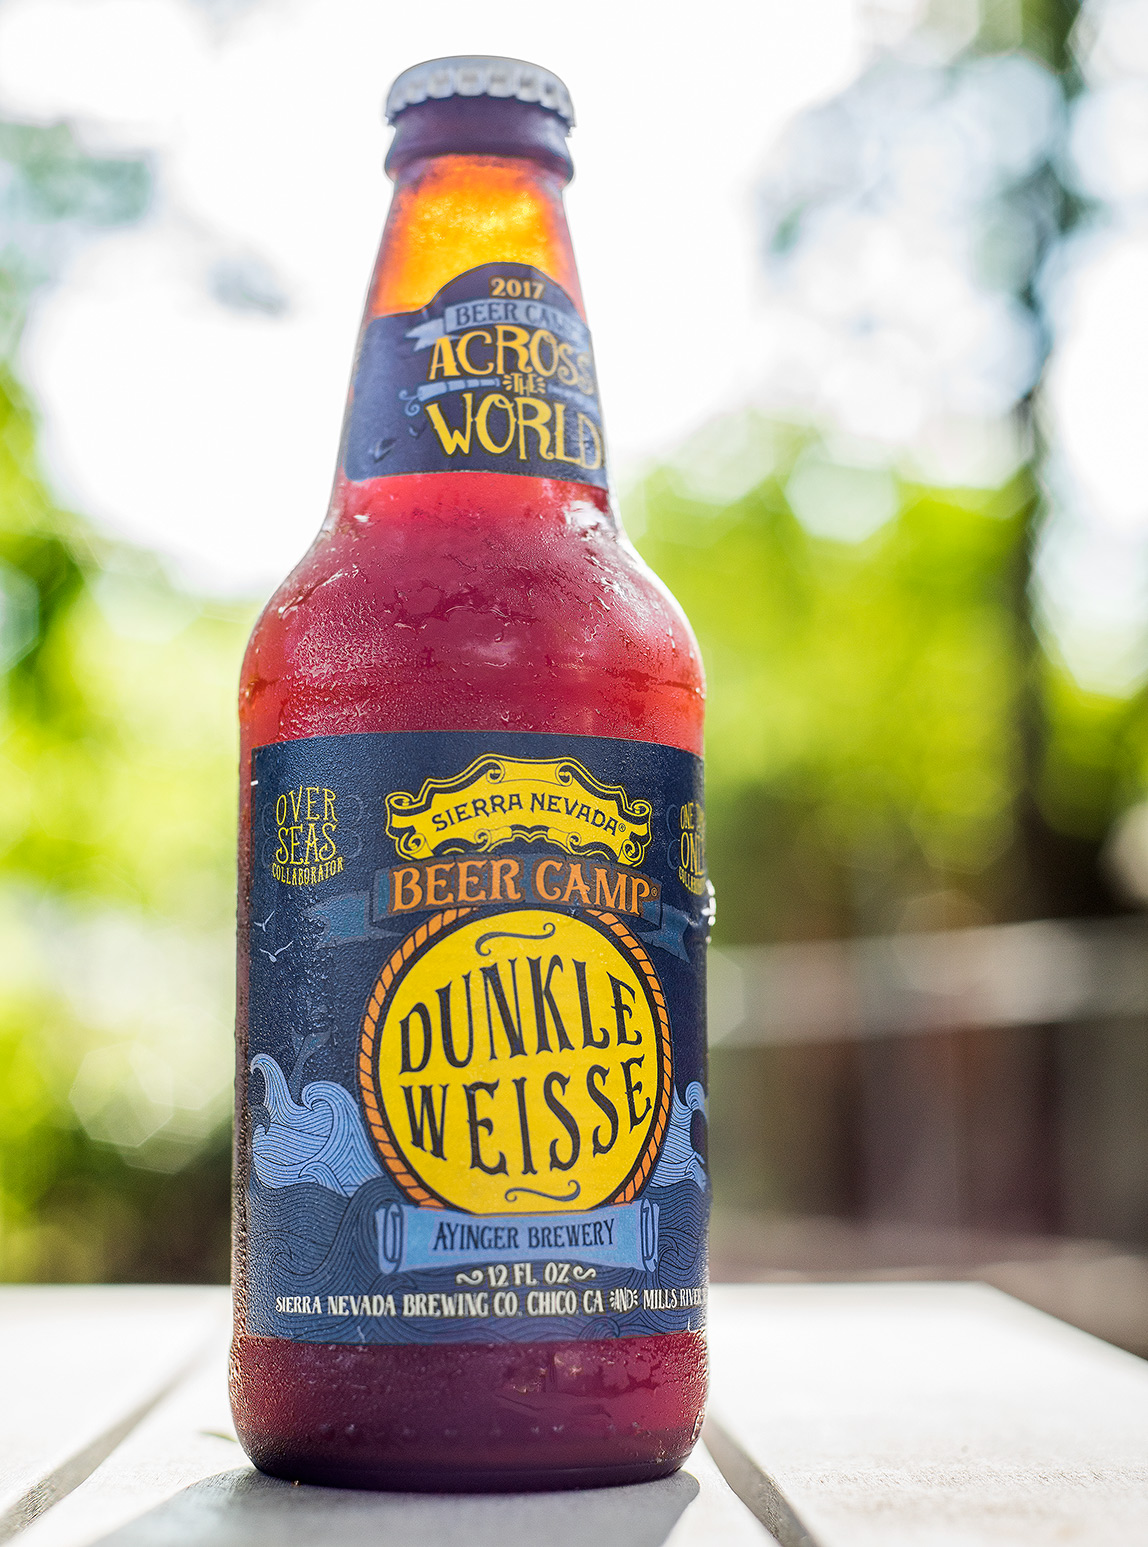 Sierra Nevada Beer Camp: Dunkle Weiss